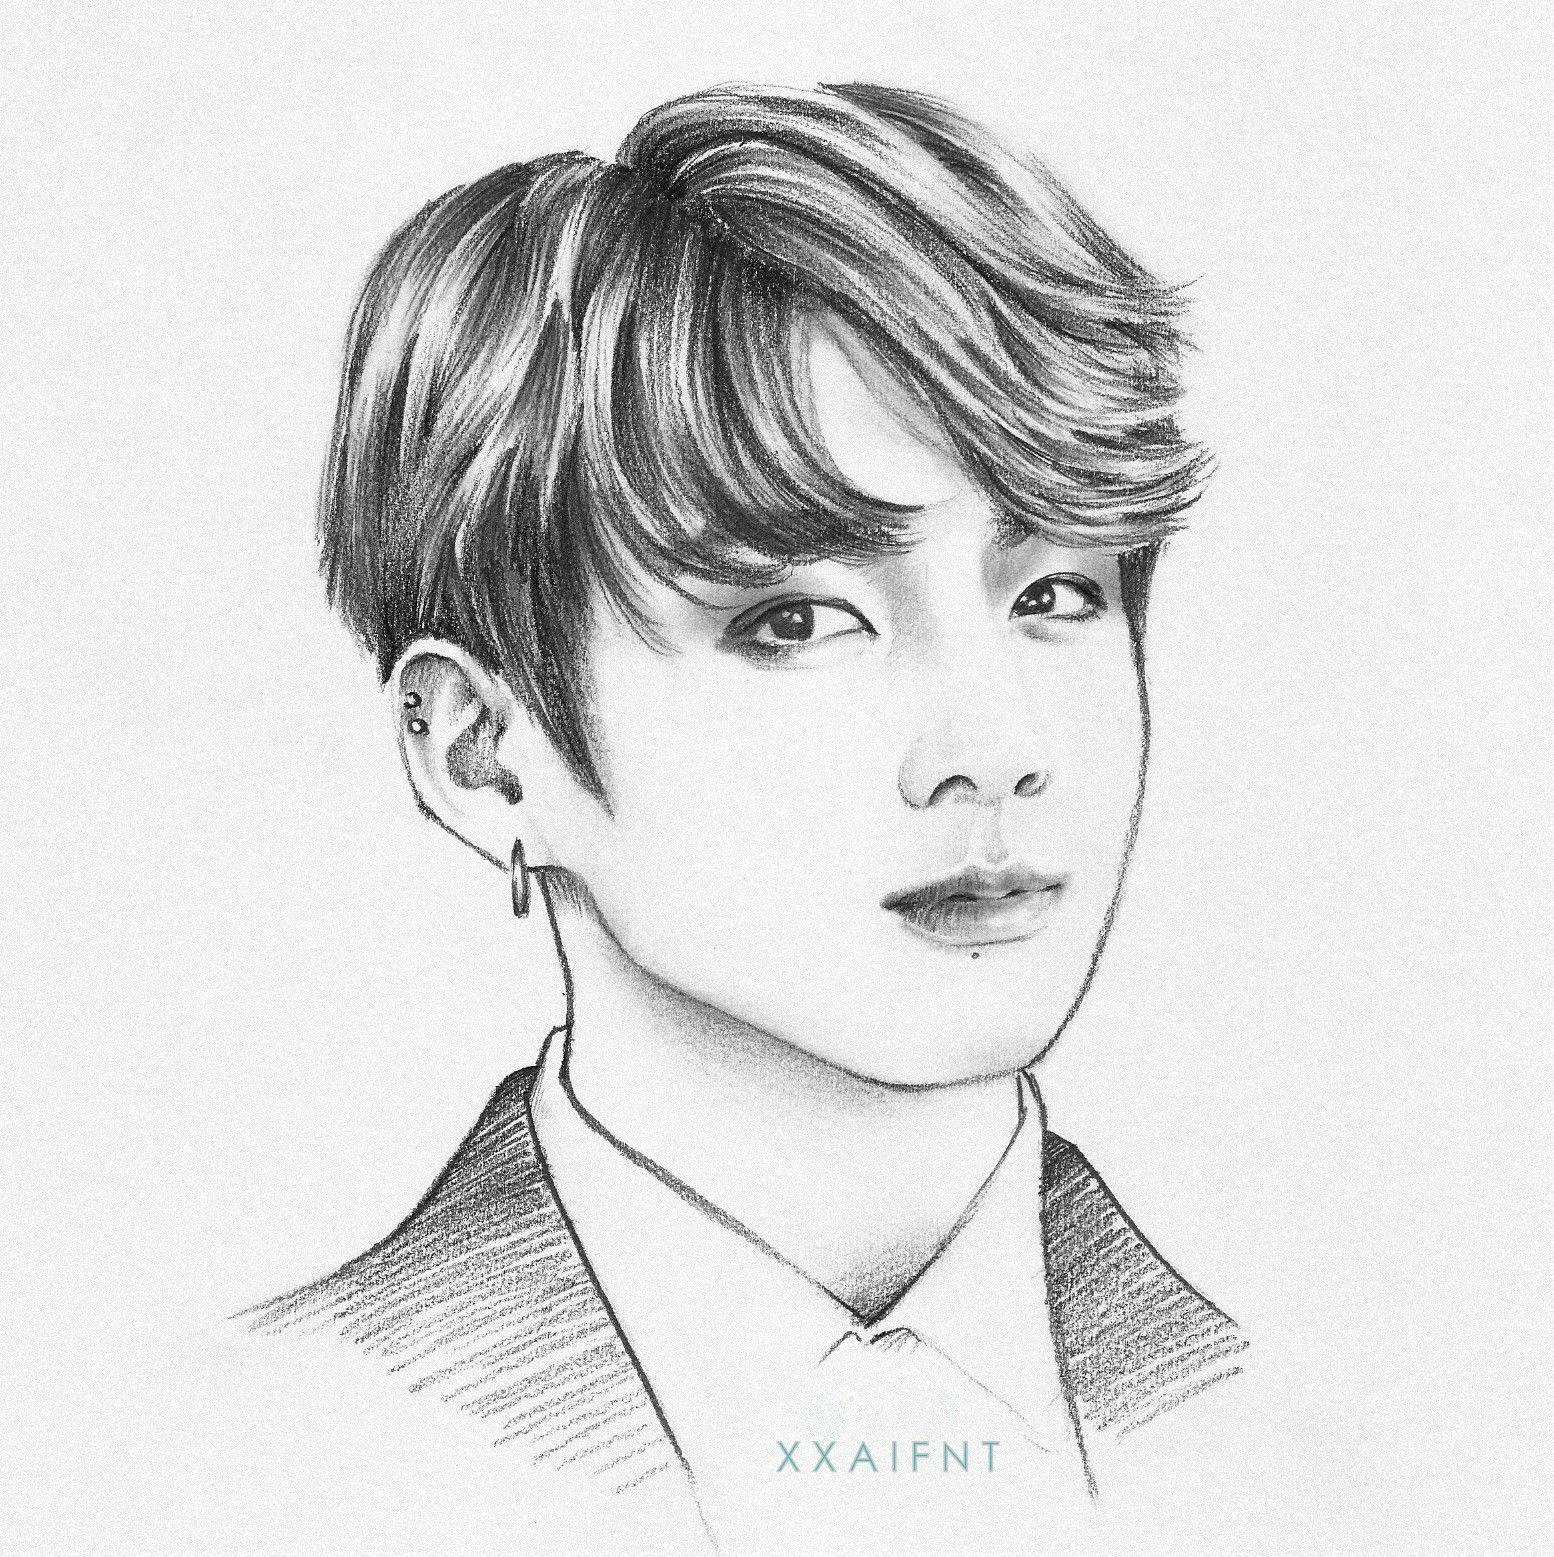 jeon jungkook fanart drawing sketch traditional art